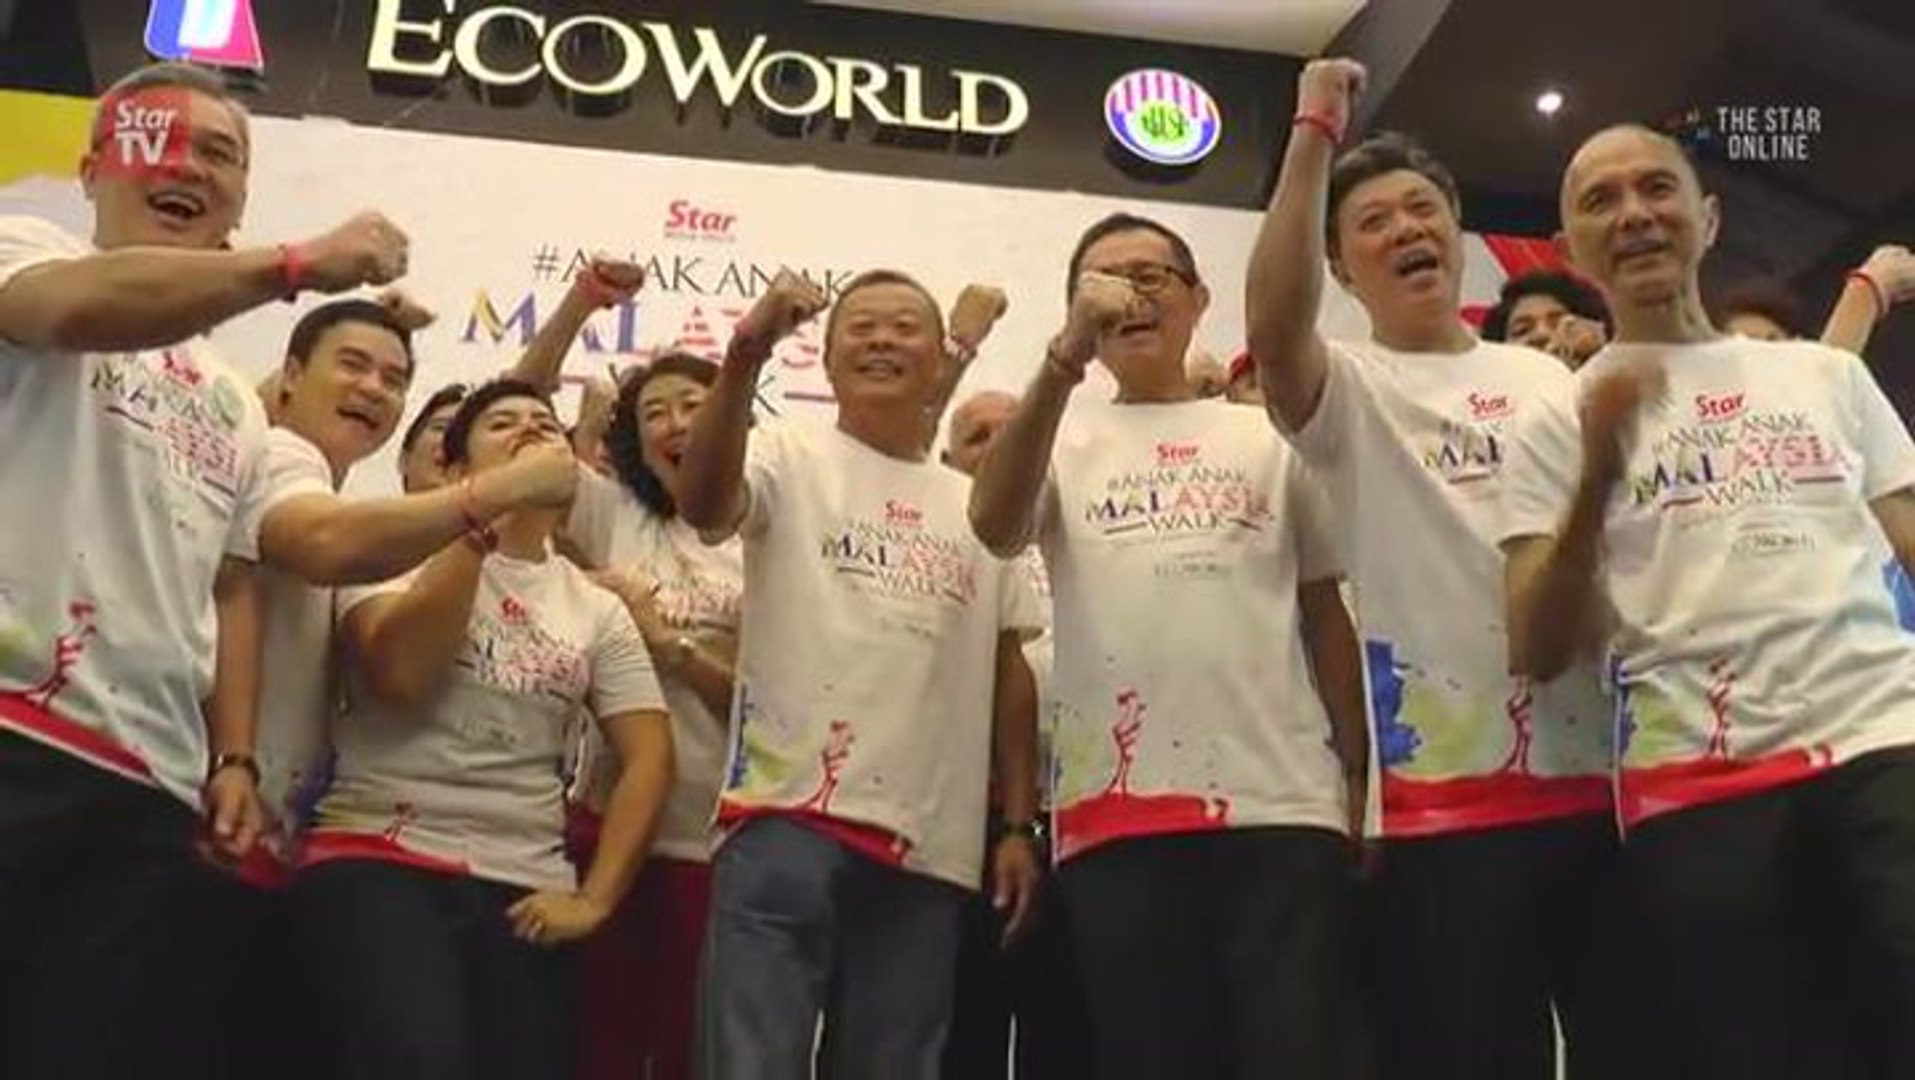 Star Media Group and EcoWorld kickstart #AnakAnakMalaysiaWalk 2016